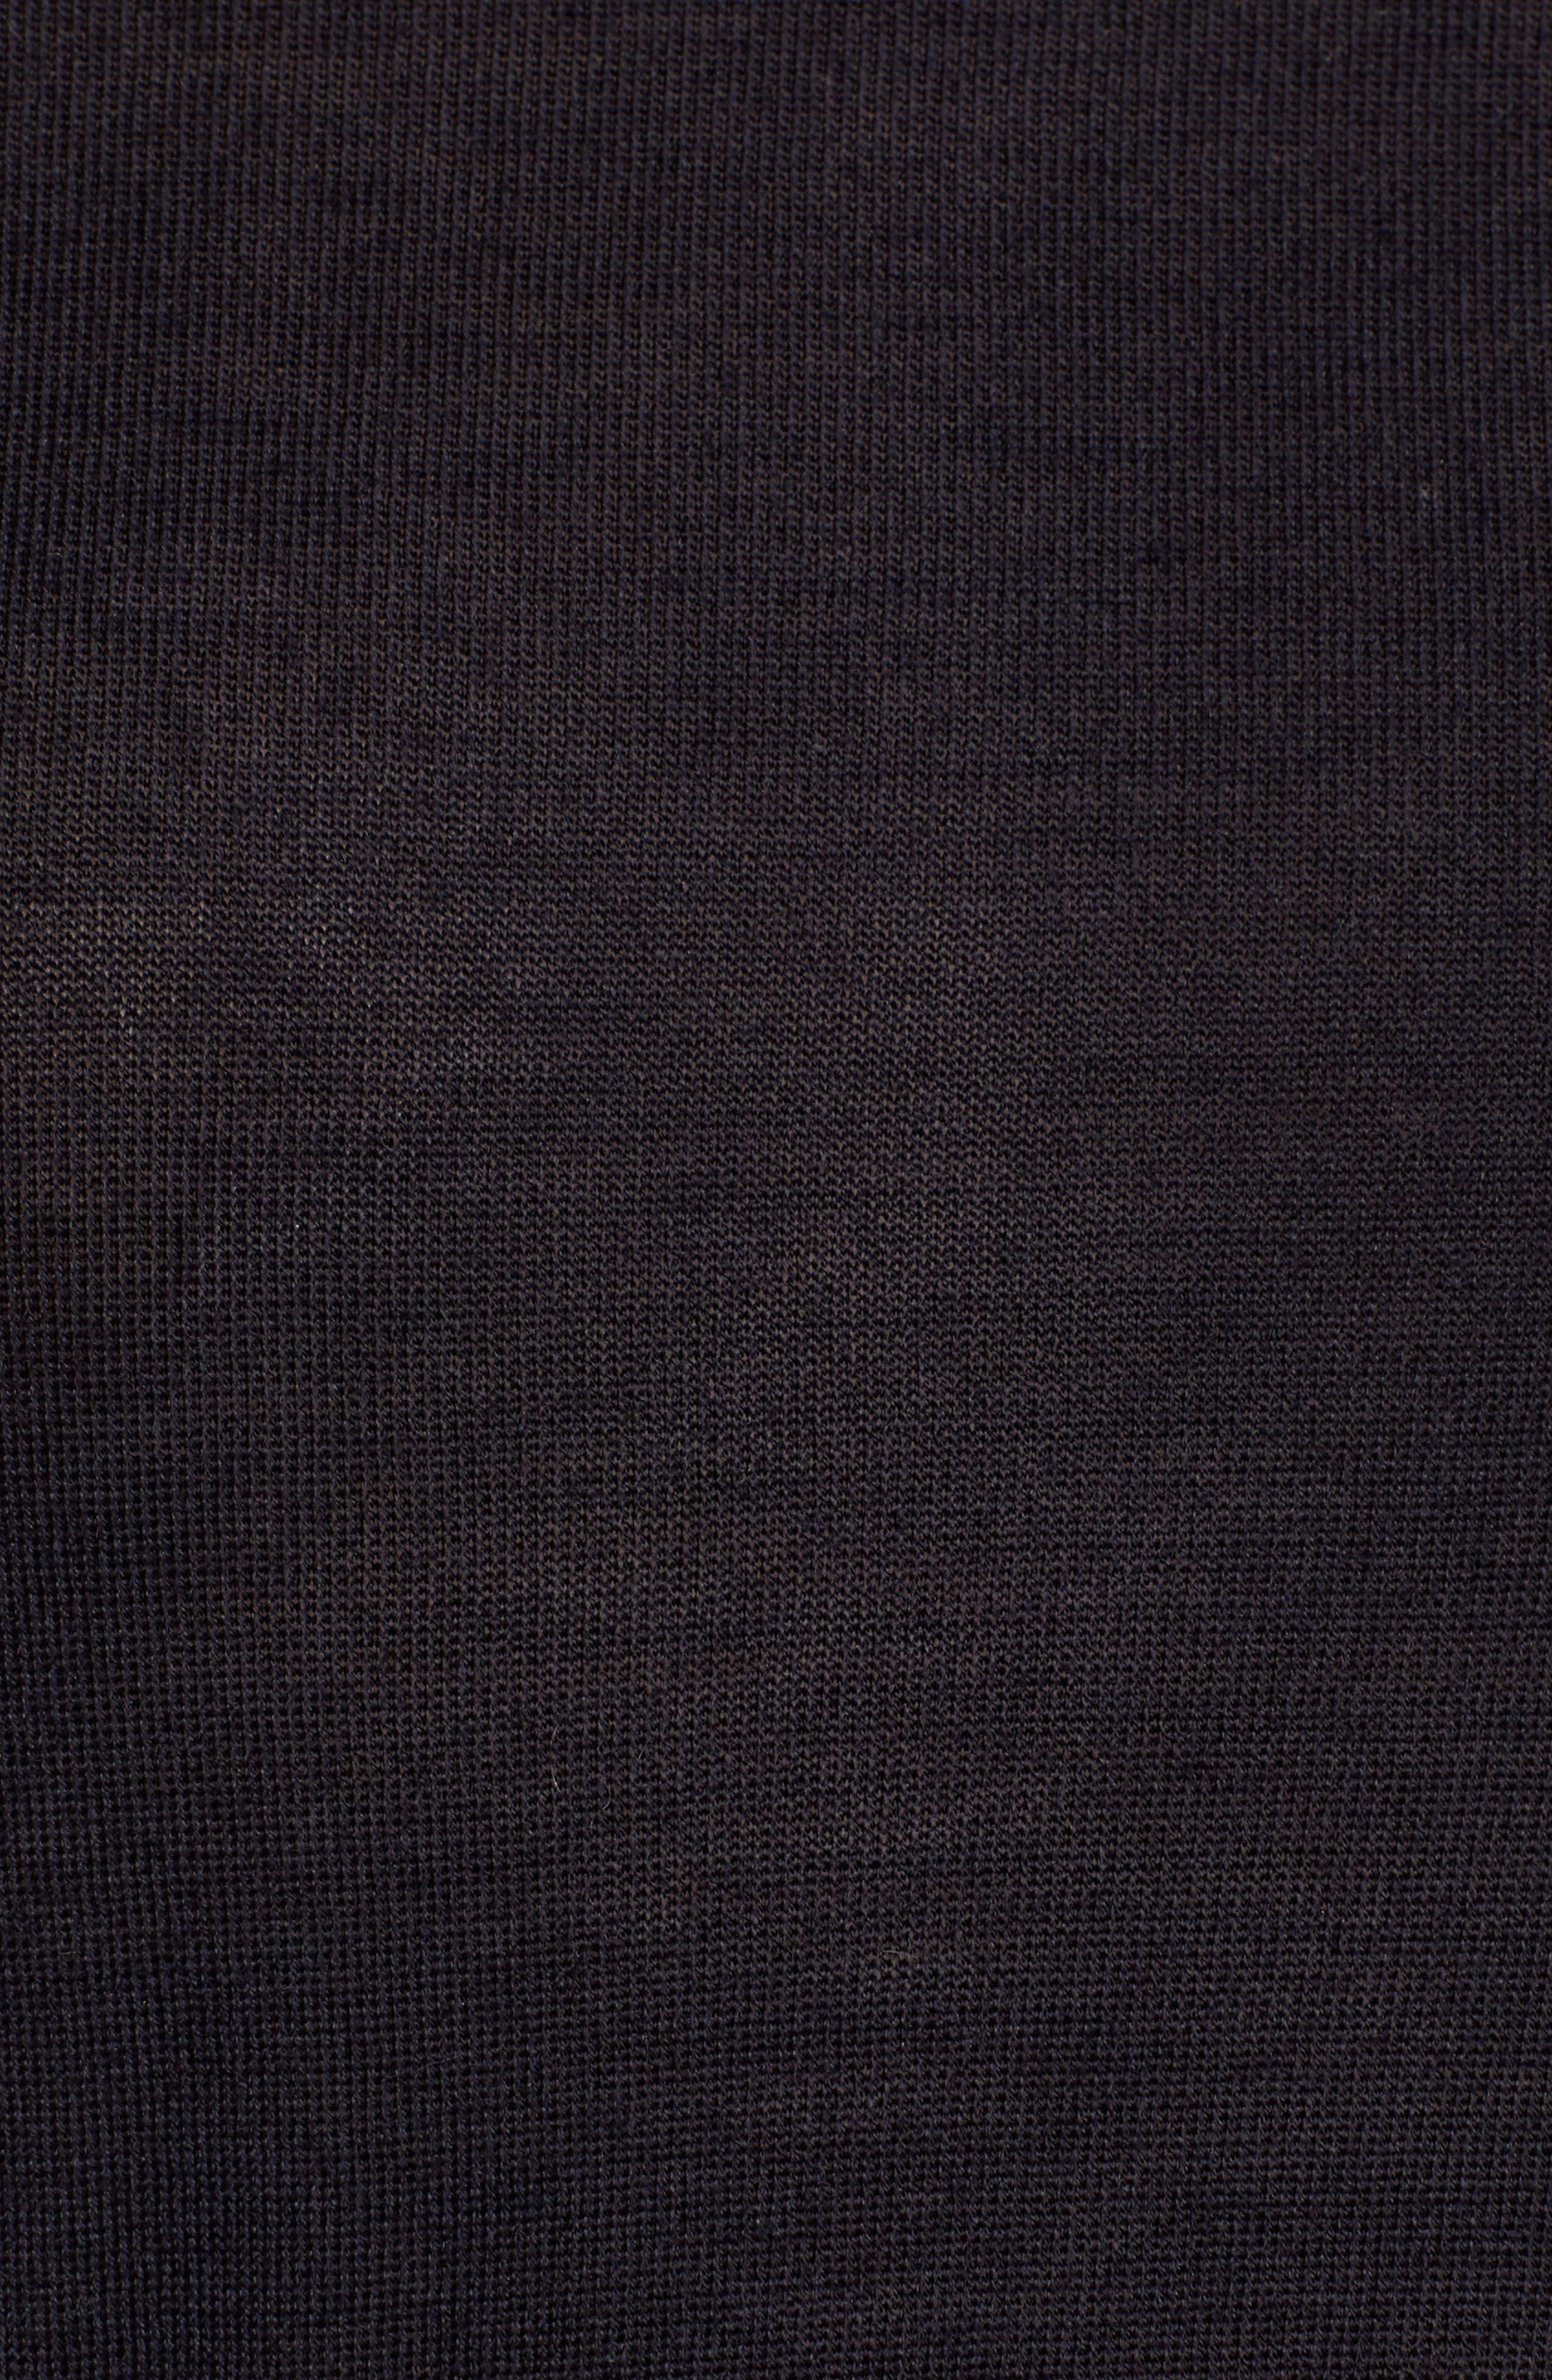 Farrella Wool Turtleneck Sweater,                             Alternate thumbnail 5, color,                             480